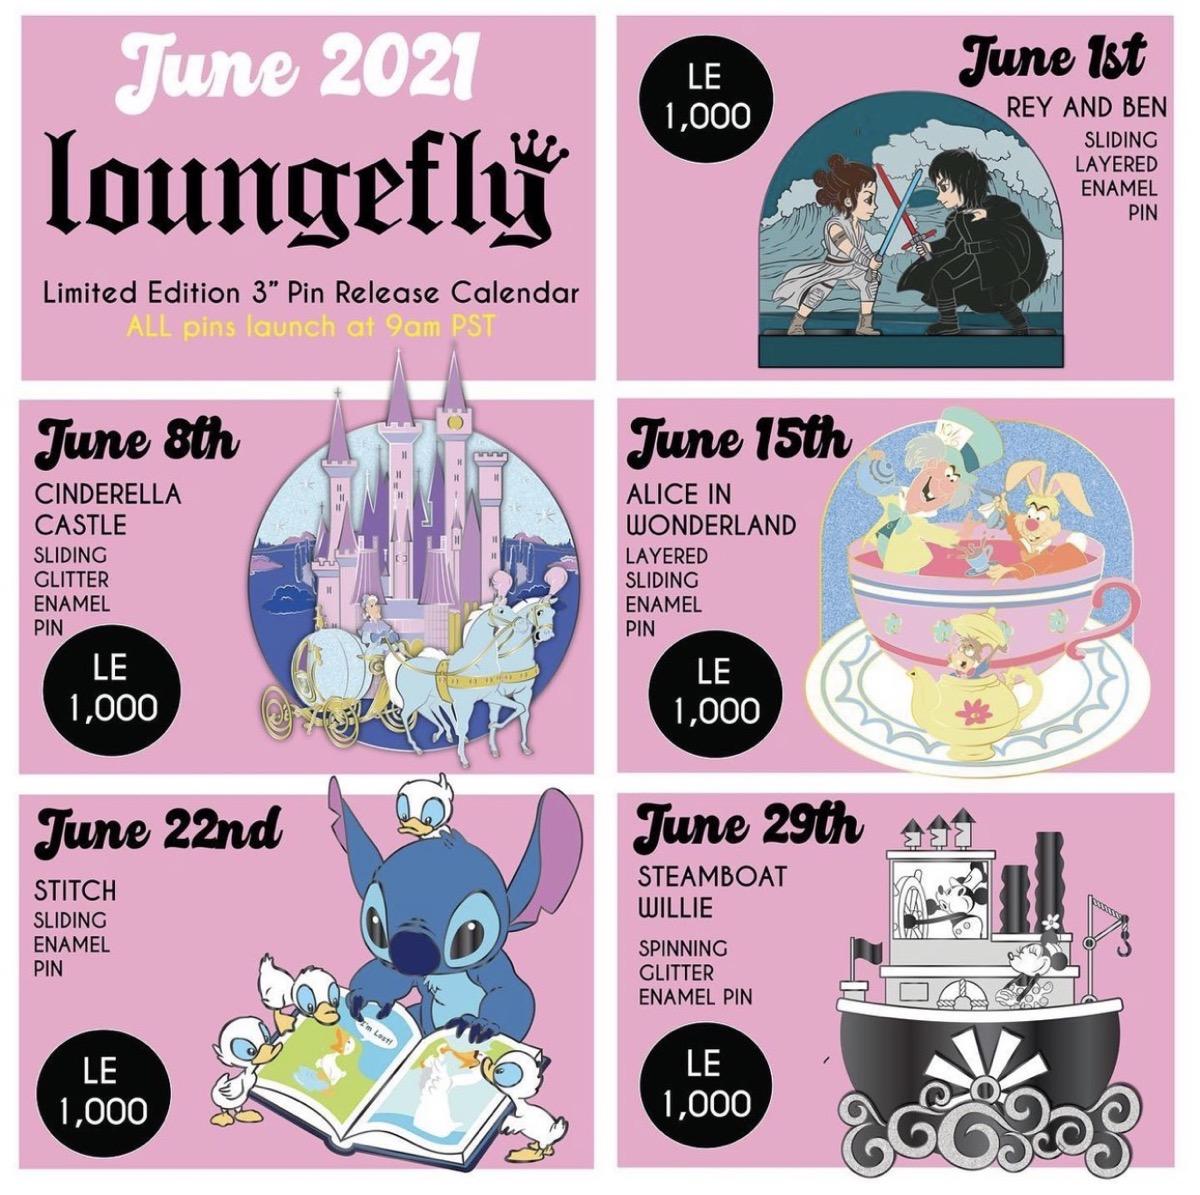 June 2021 Loungefly Disney Pin Release Calendar